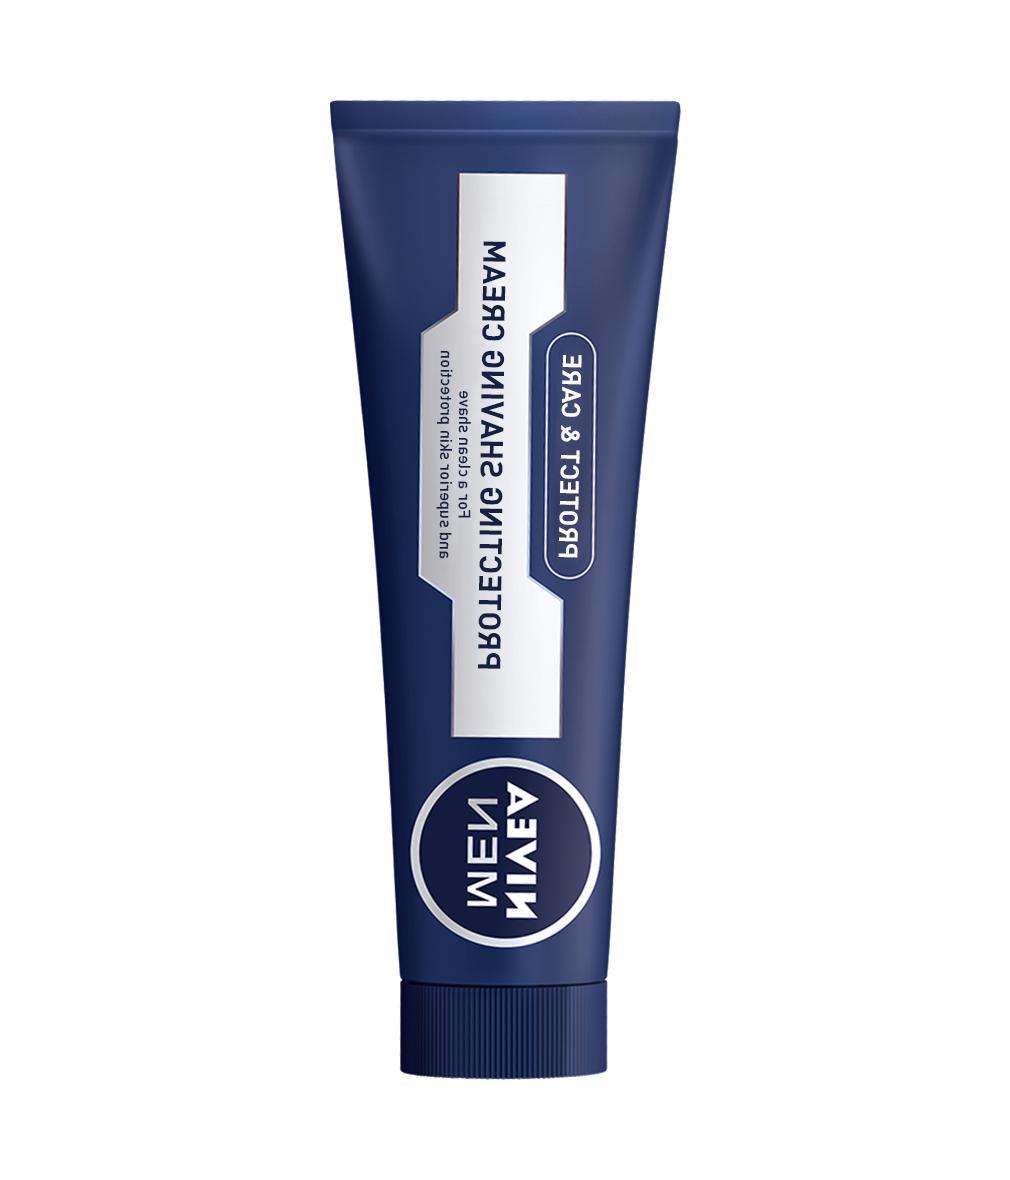 men protect and care shaving cream 3